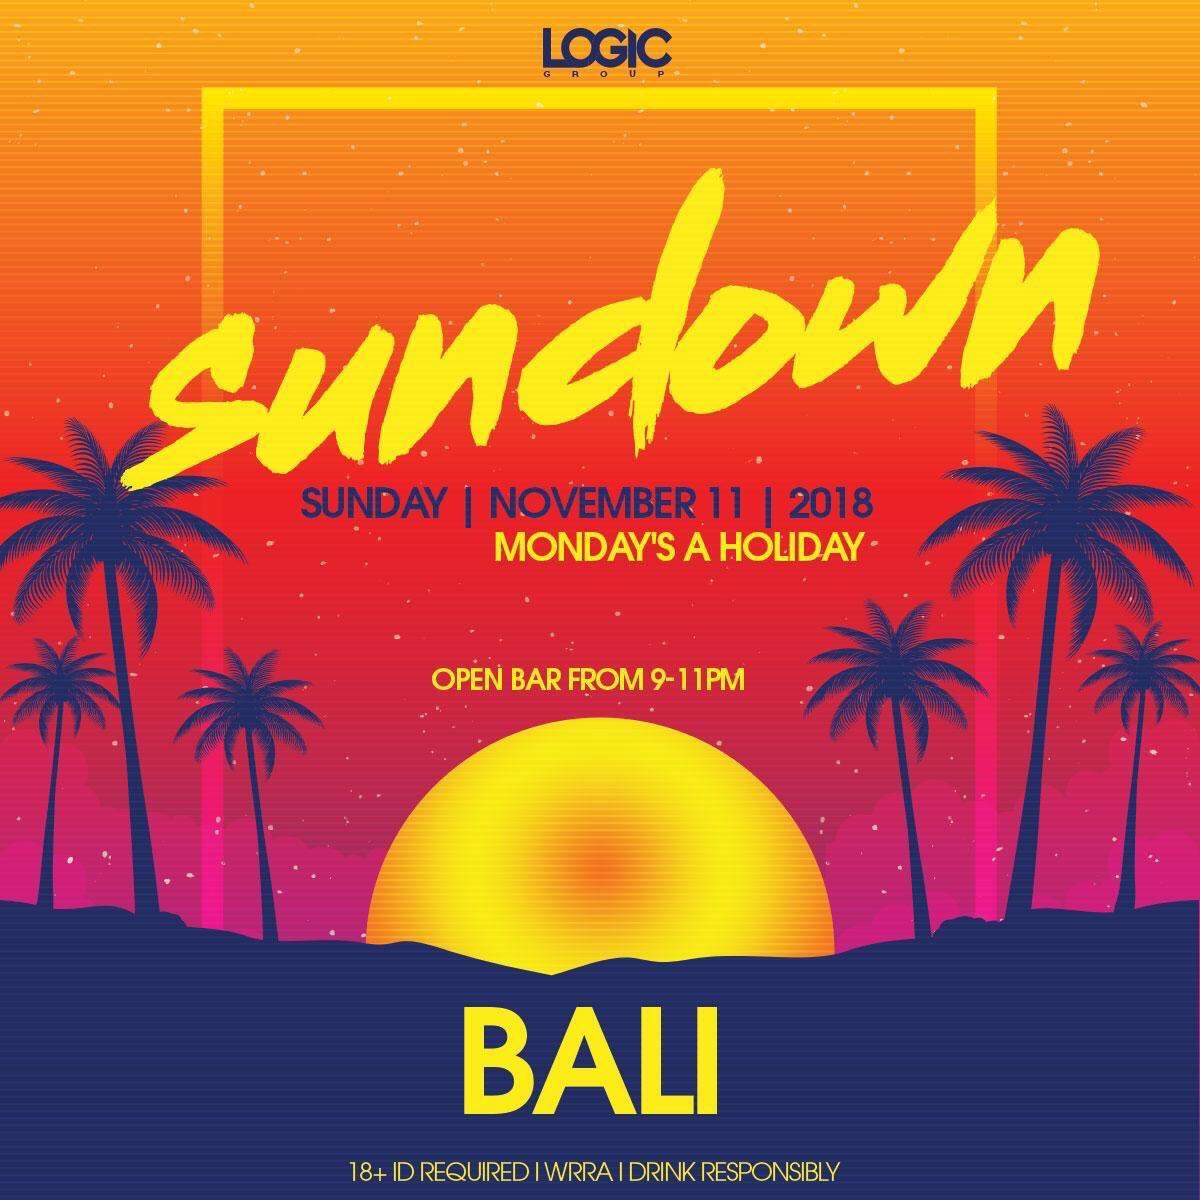 Hoy Domingo de Bali ✨ (Maui 2nd Floor) Open bar de 9-11pm